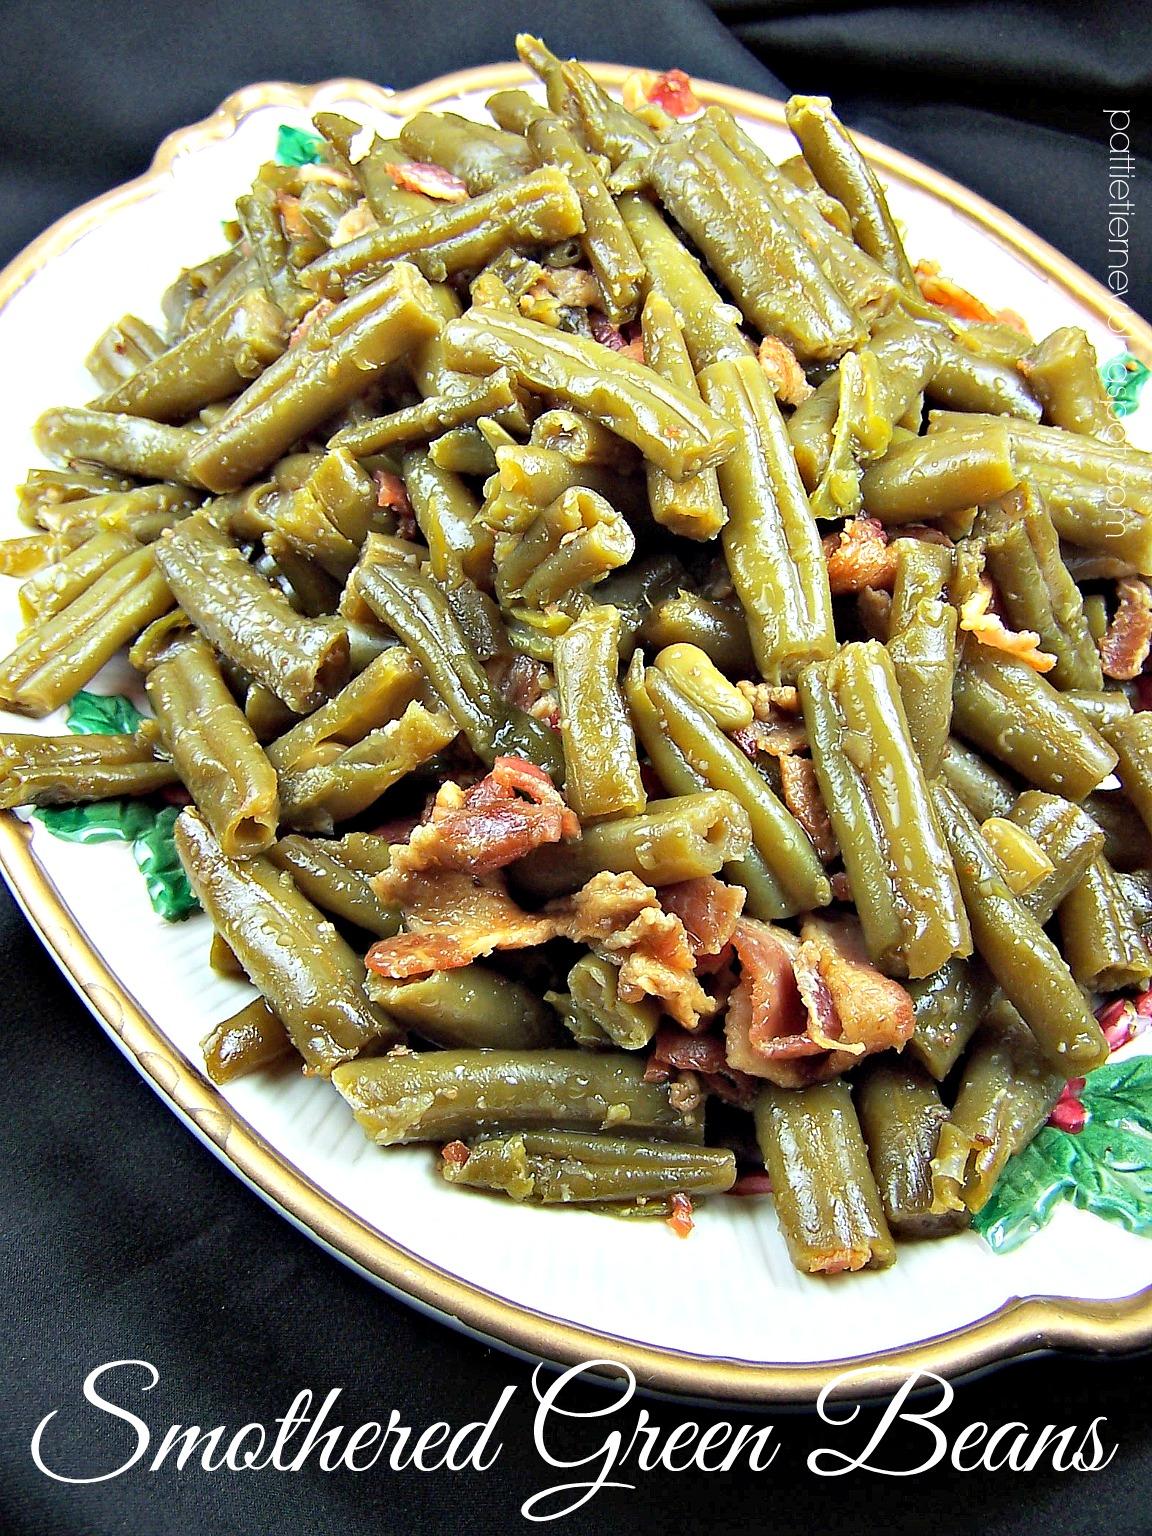 Olla-Podrida: Smothered Green Beans